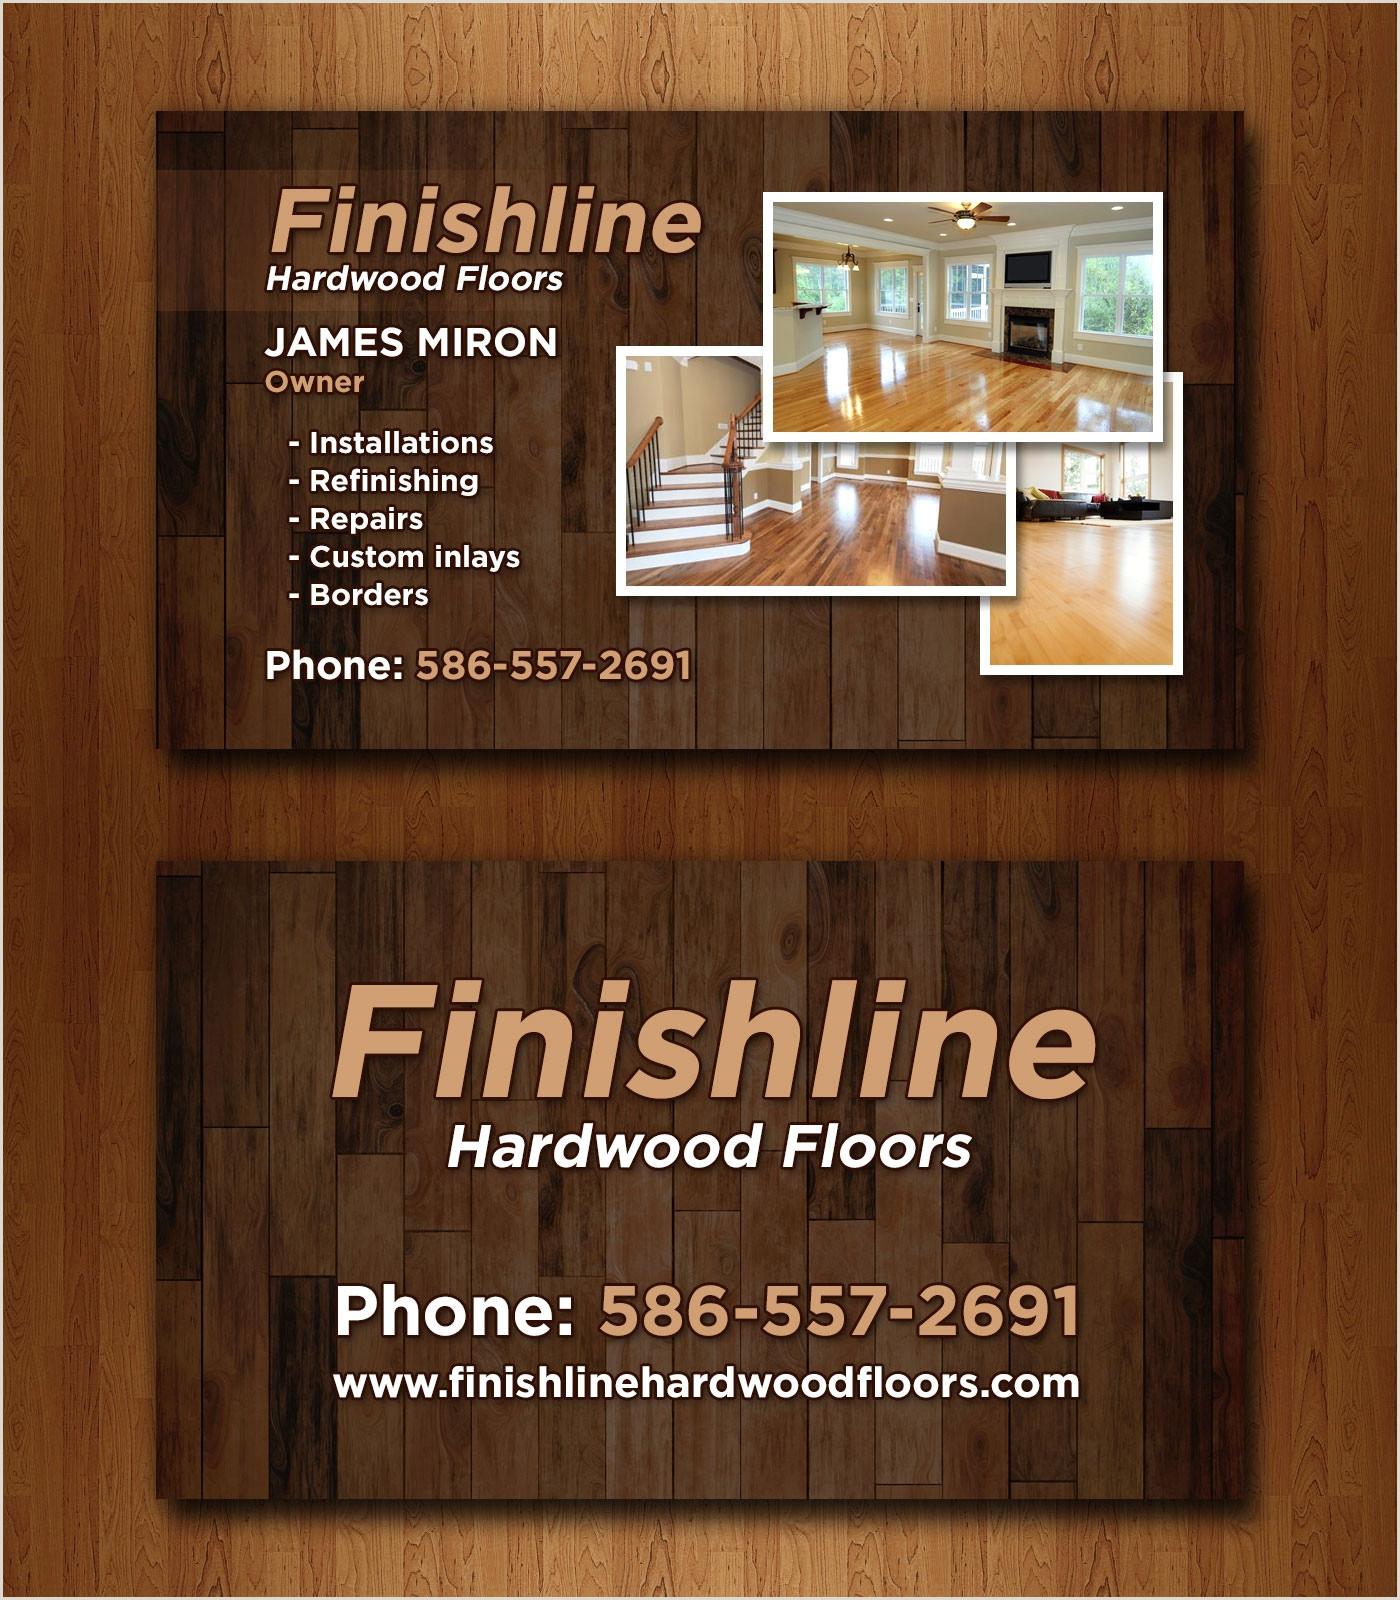 Sleek Business Card Design 14 Popular Hardwood Flooring Business Card Template